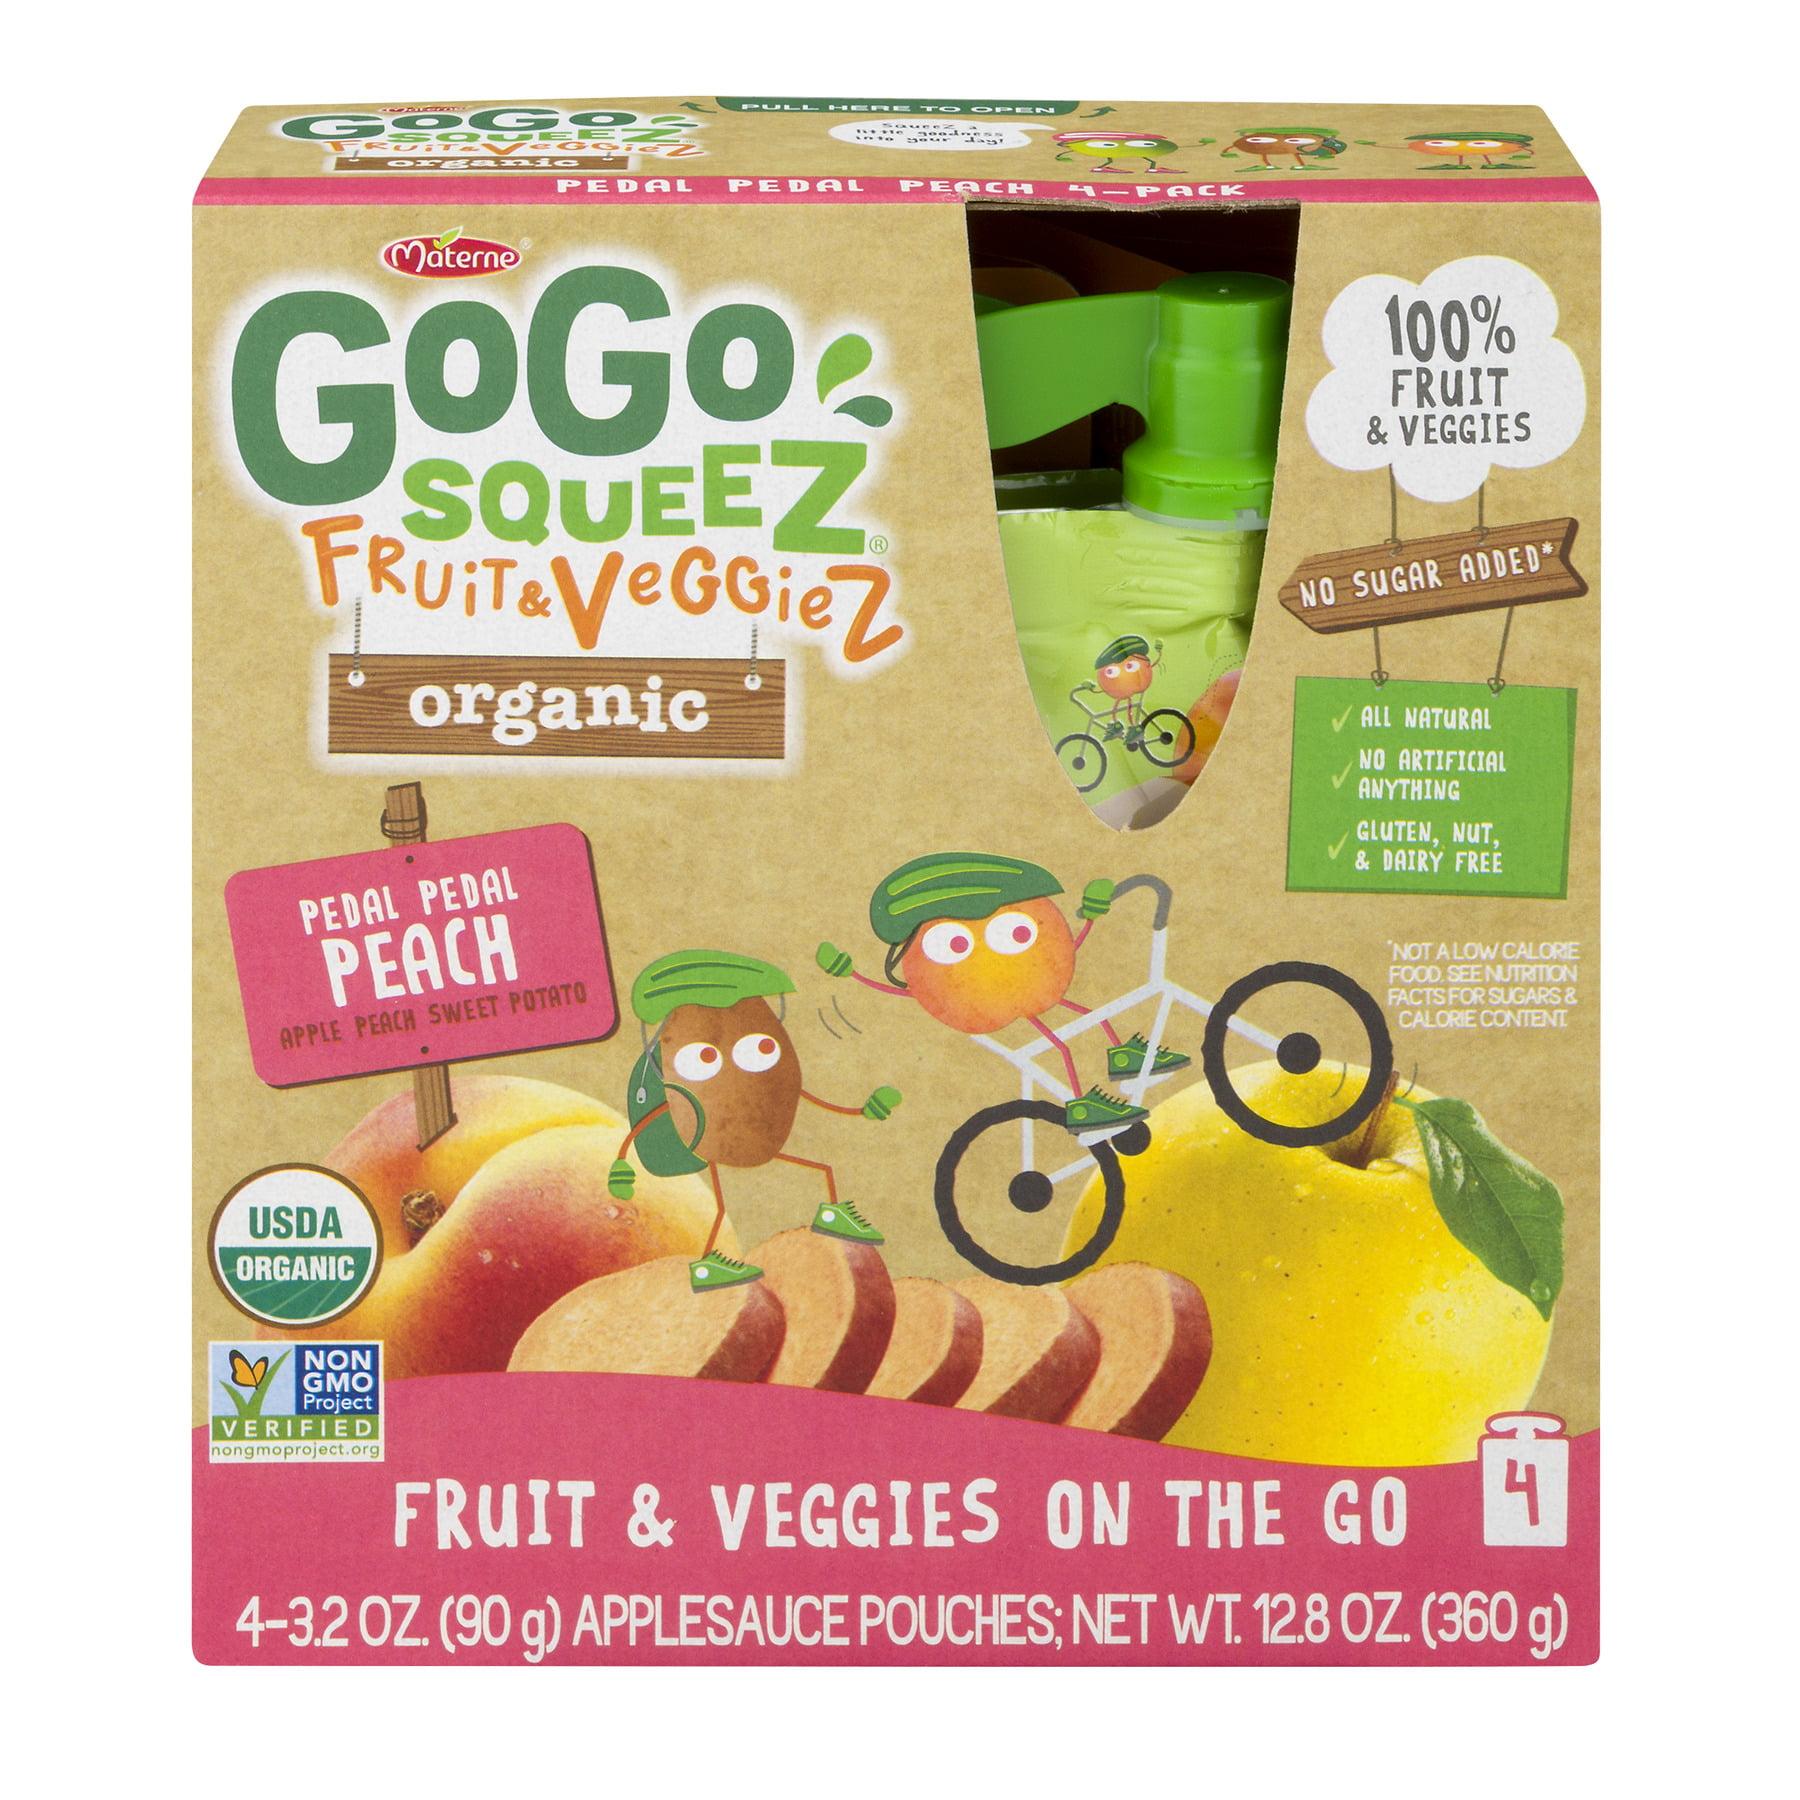 GoGo squeeZ Organic Fruit & VeggieZ on the Go, Apple Peach Sweet Potato, 3.2 Ounce (4 Pack), Unsweetened, Healthy Snacks, Gluten Free, Vegan Friendly, Reclosable, BPA Free Pouches